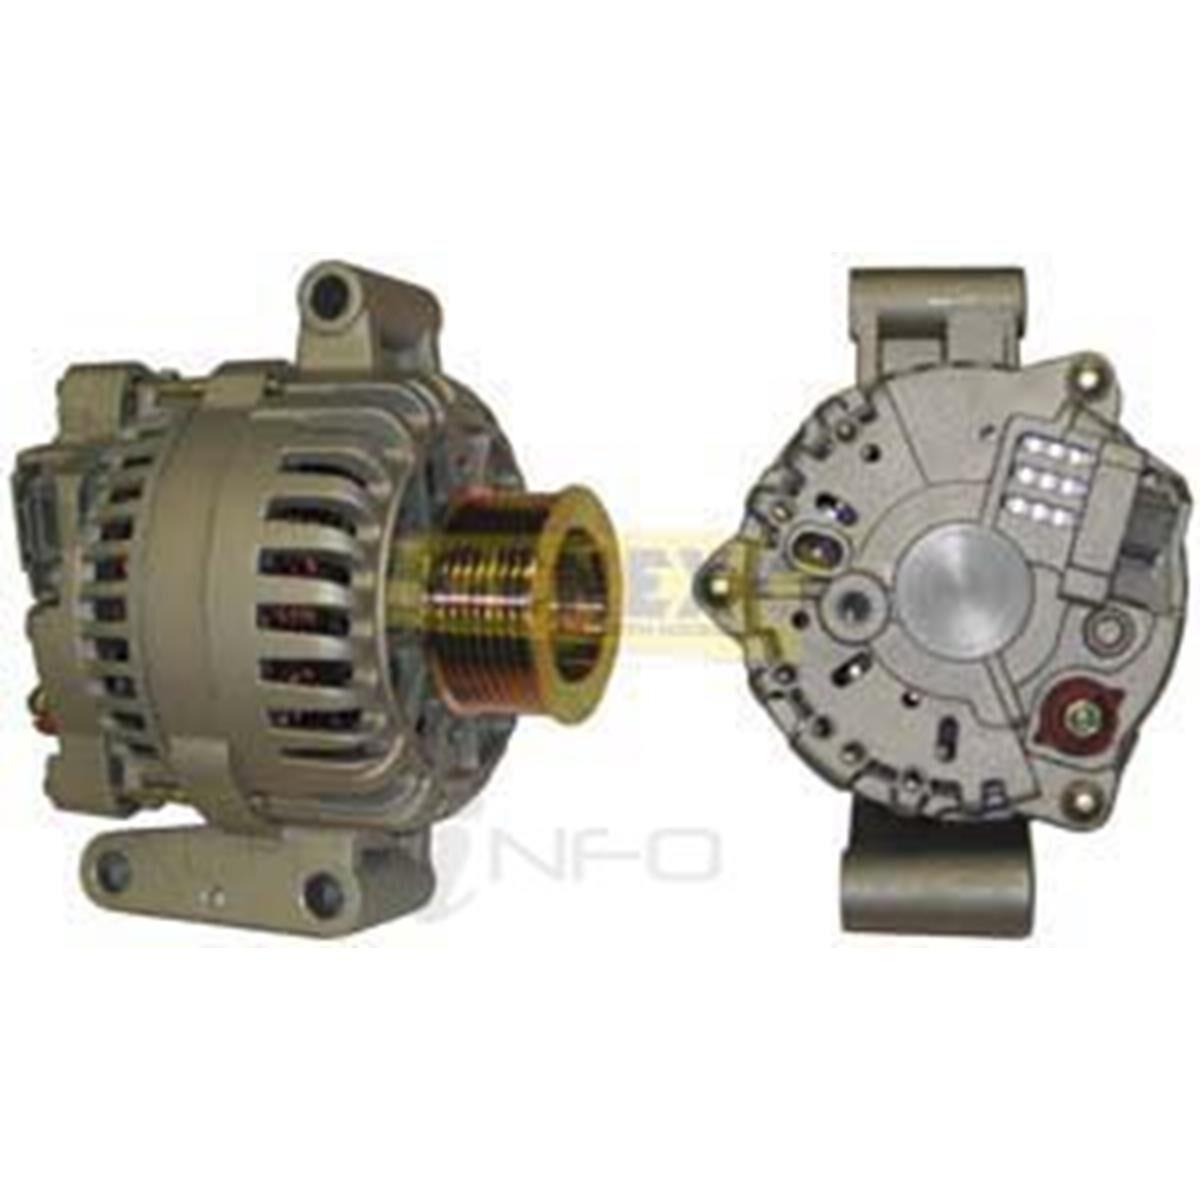 99 camry fuse box diagram 25 wiring diagram images 87 4runner 89 4runner interior 2011 toyota [ 1200 x 1200 Pixel ]